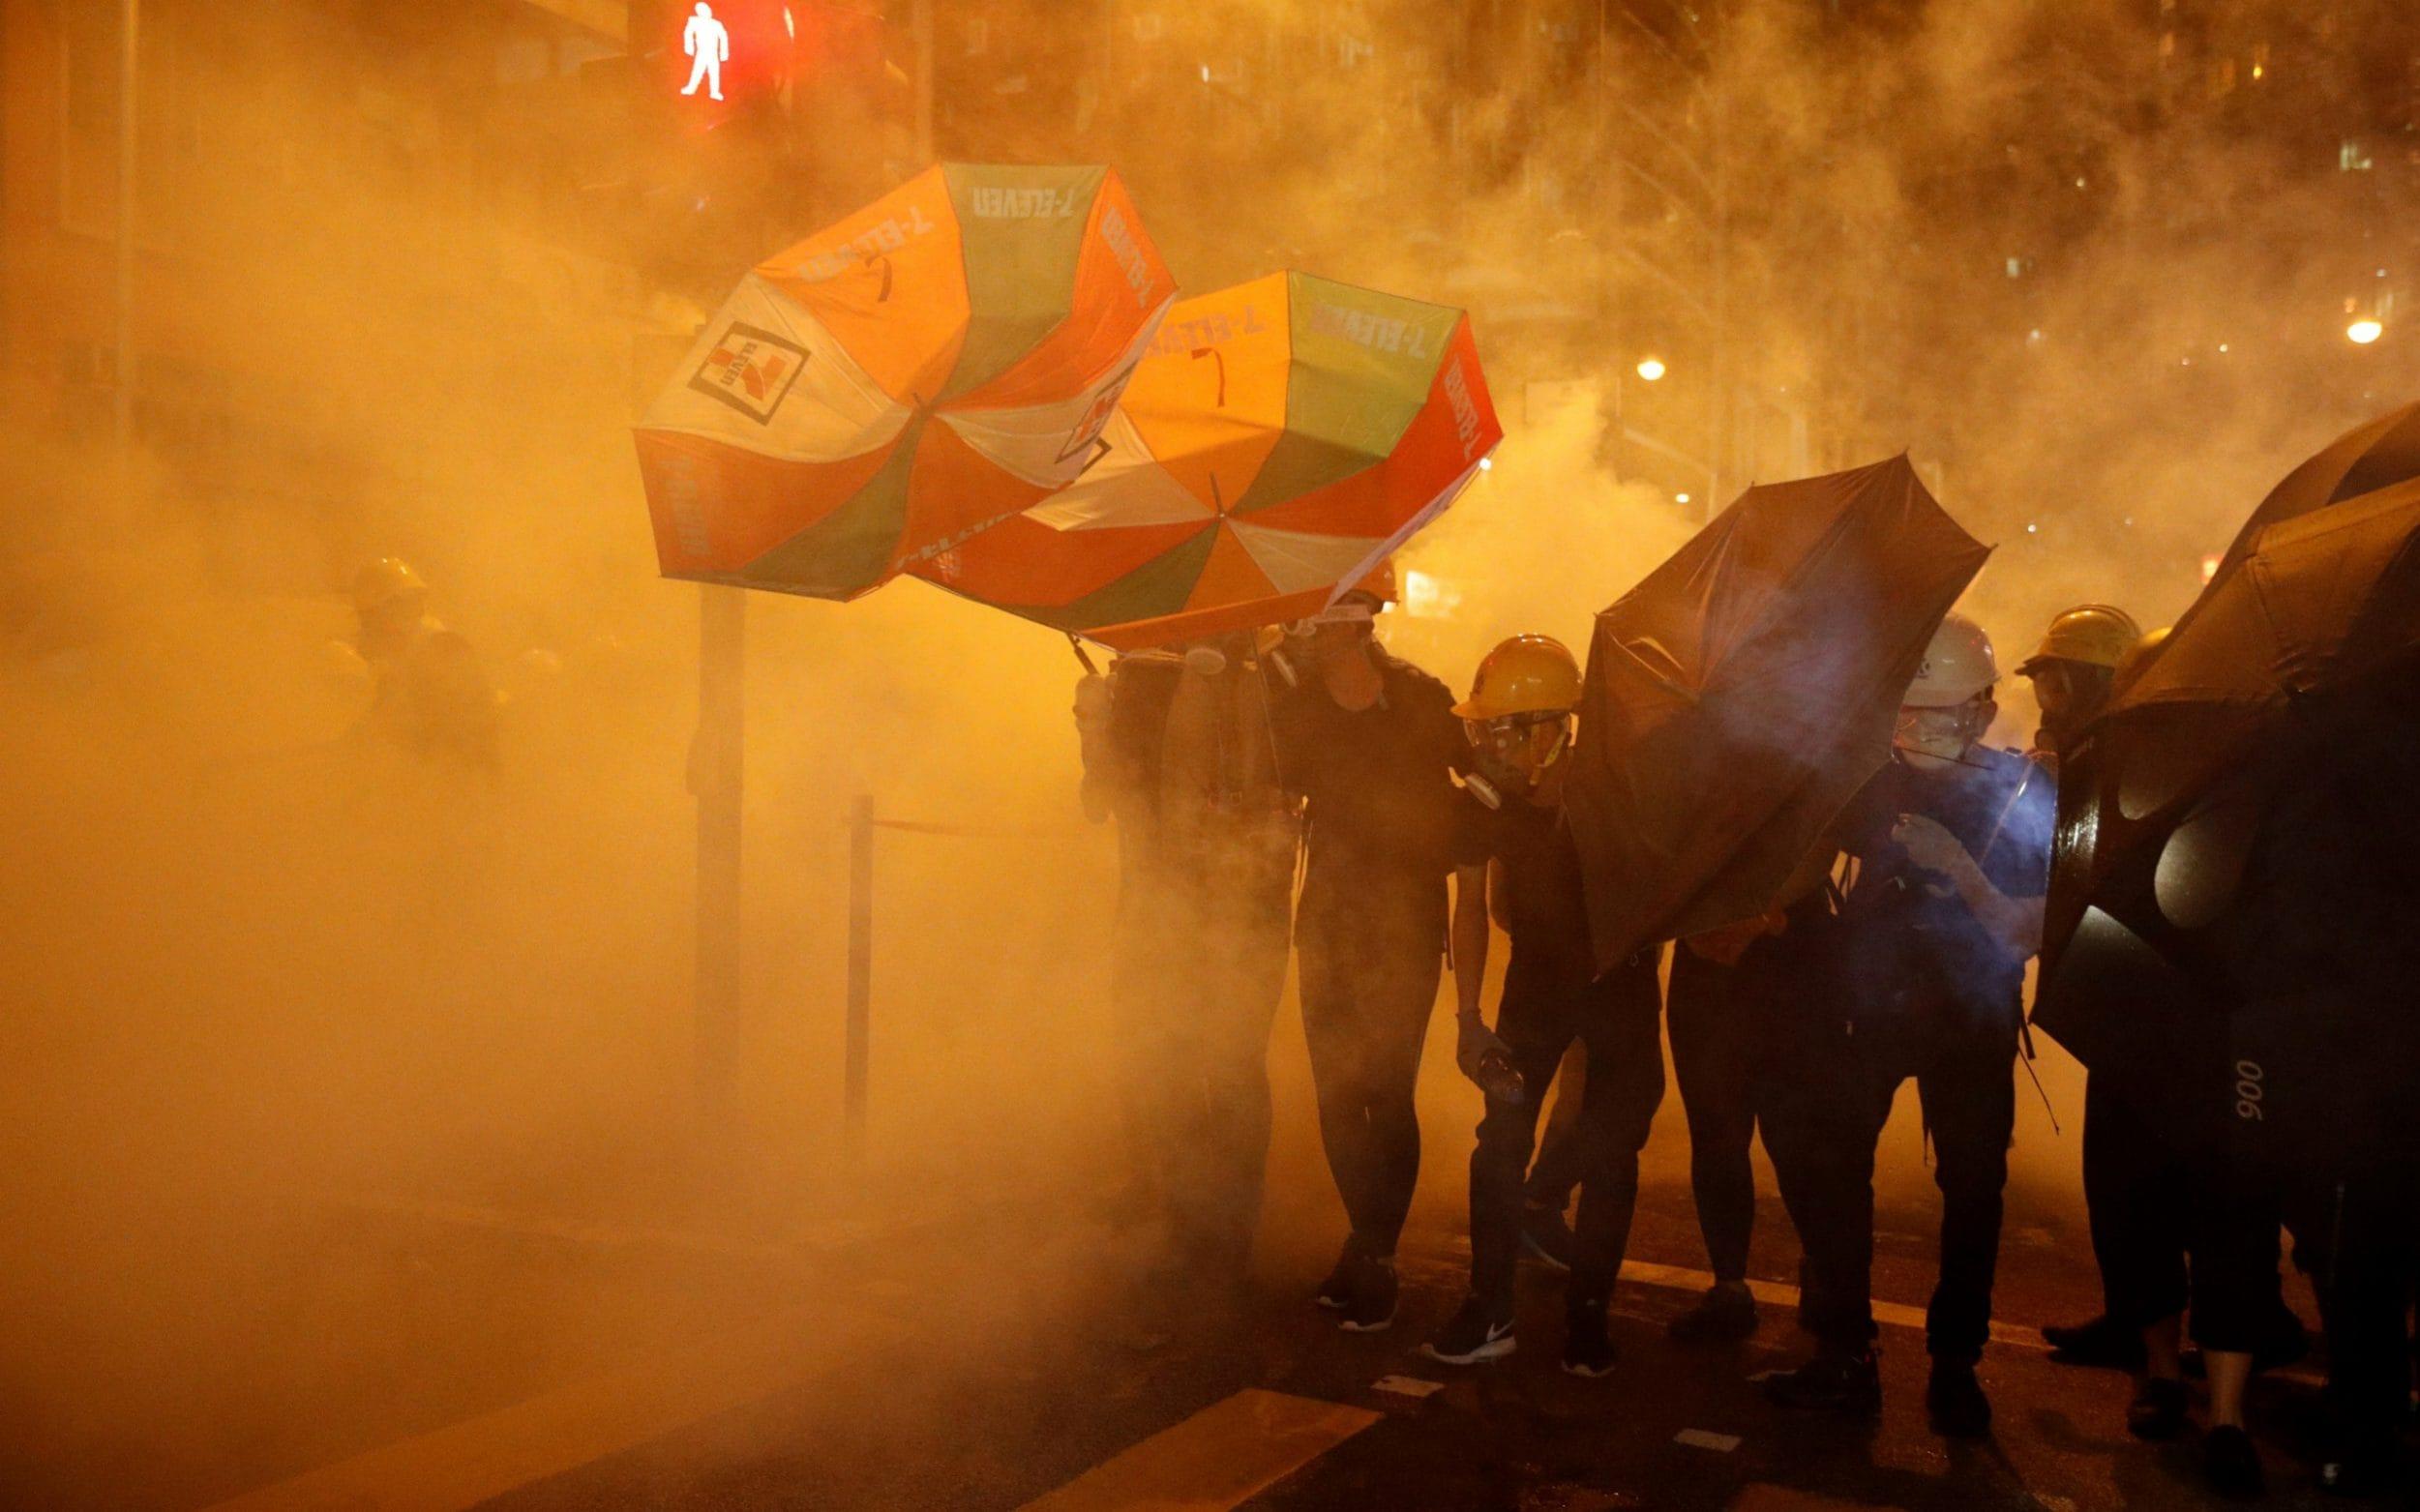 Donald Trump warns China crackdown on Hong Kong protesters will scotch trade deal